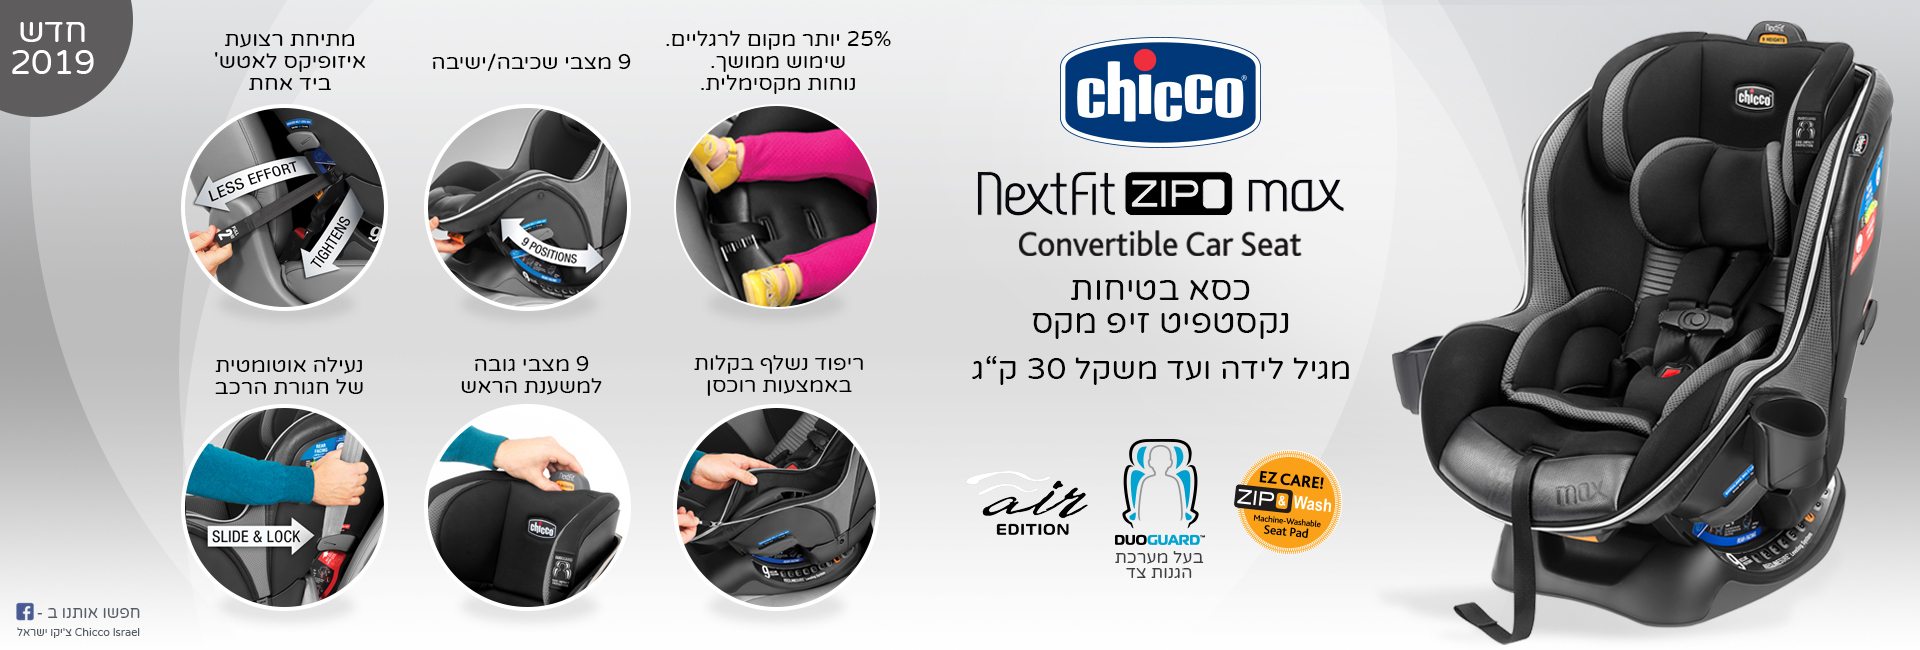 Chicco - NextFit Zip Max